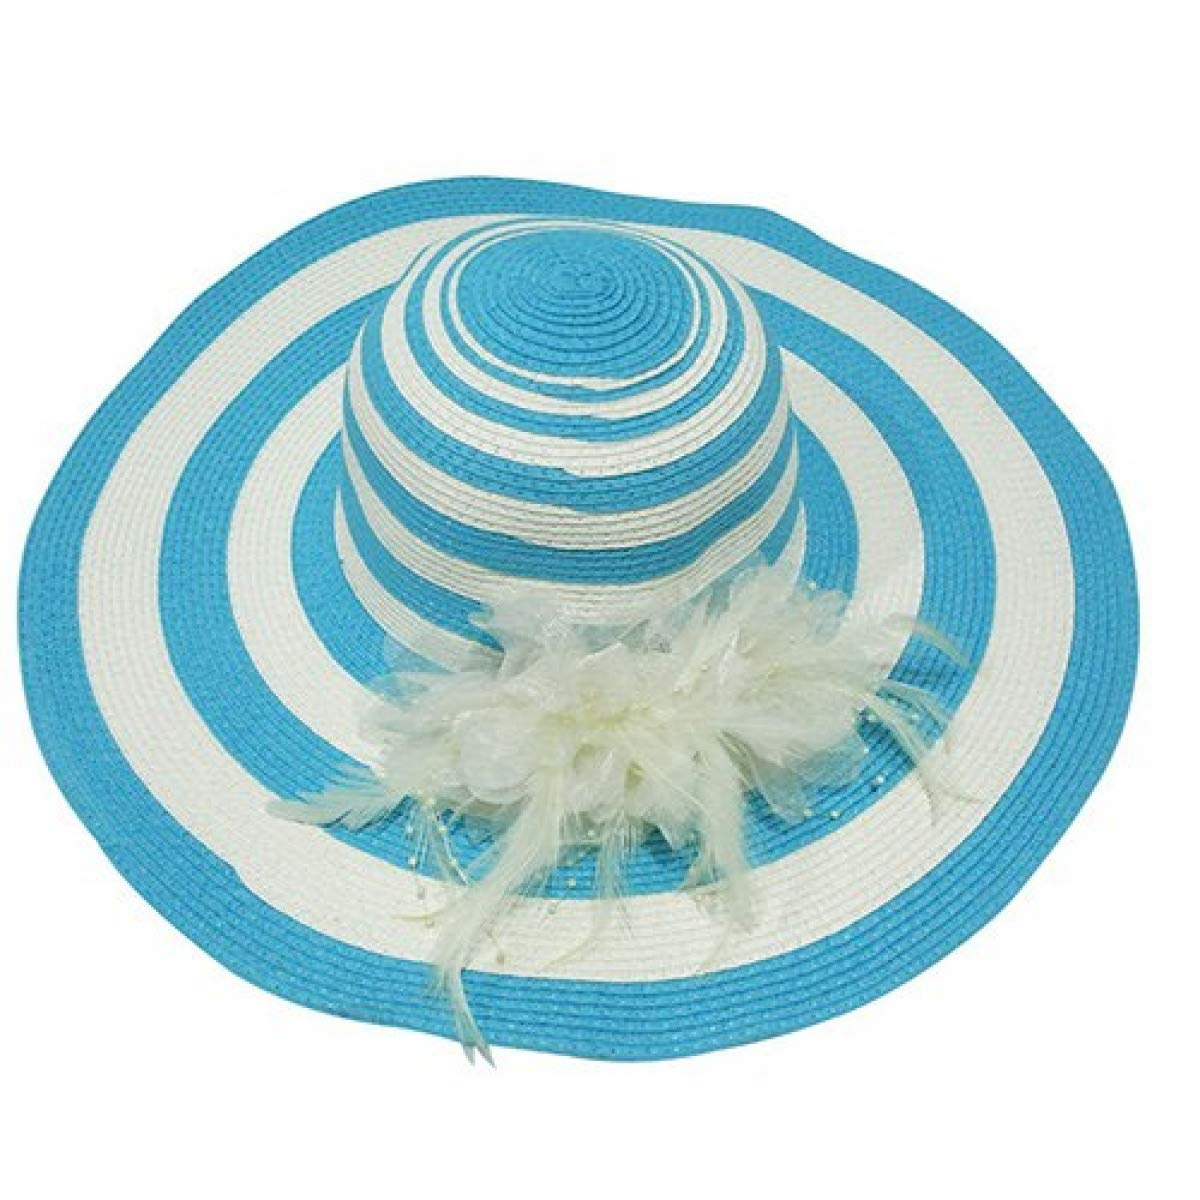 Big Wide Brim Summer Beach Hats for Women Floppy Stripe Design Sunscreen Girls Sun Hat